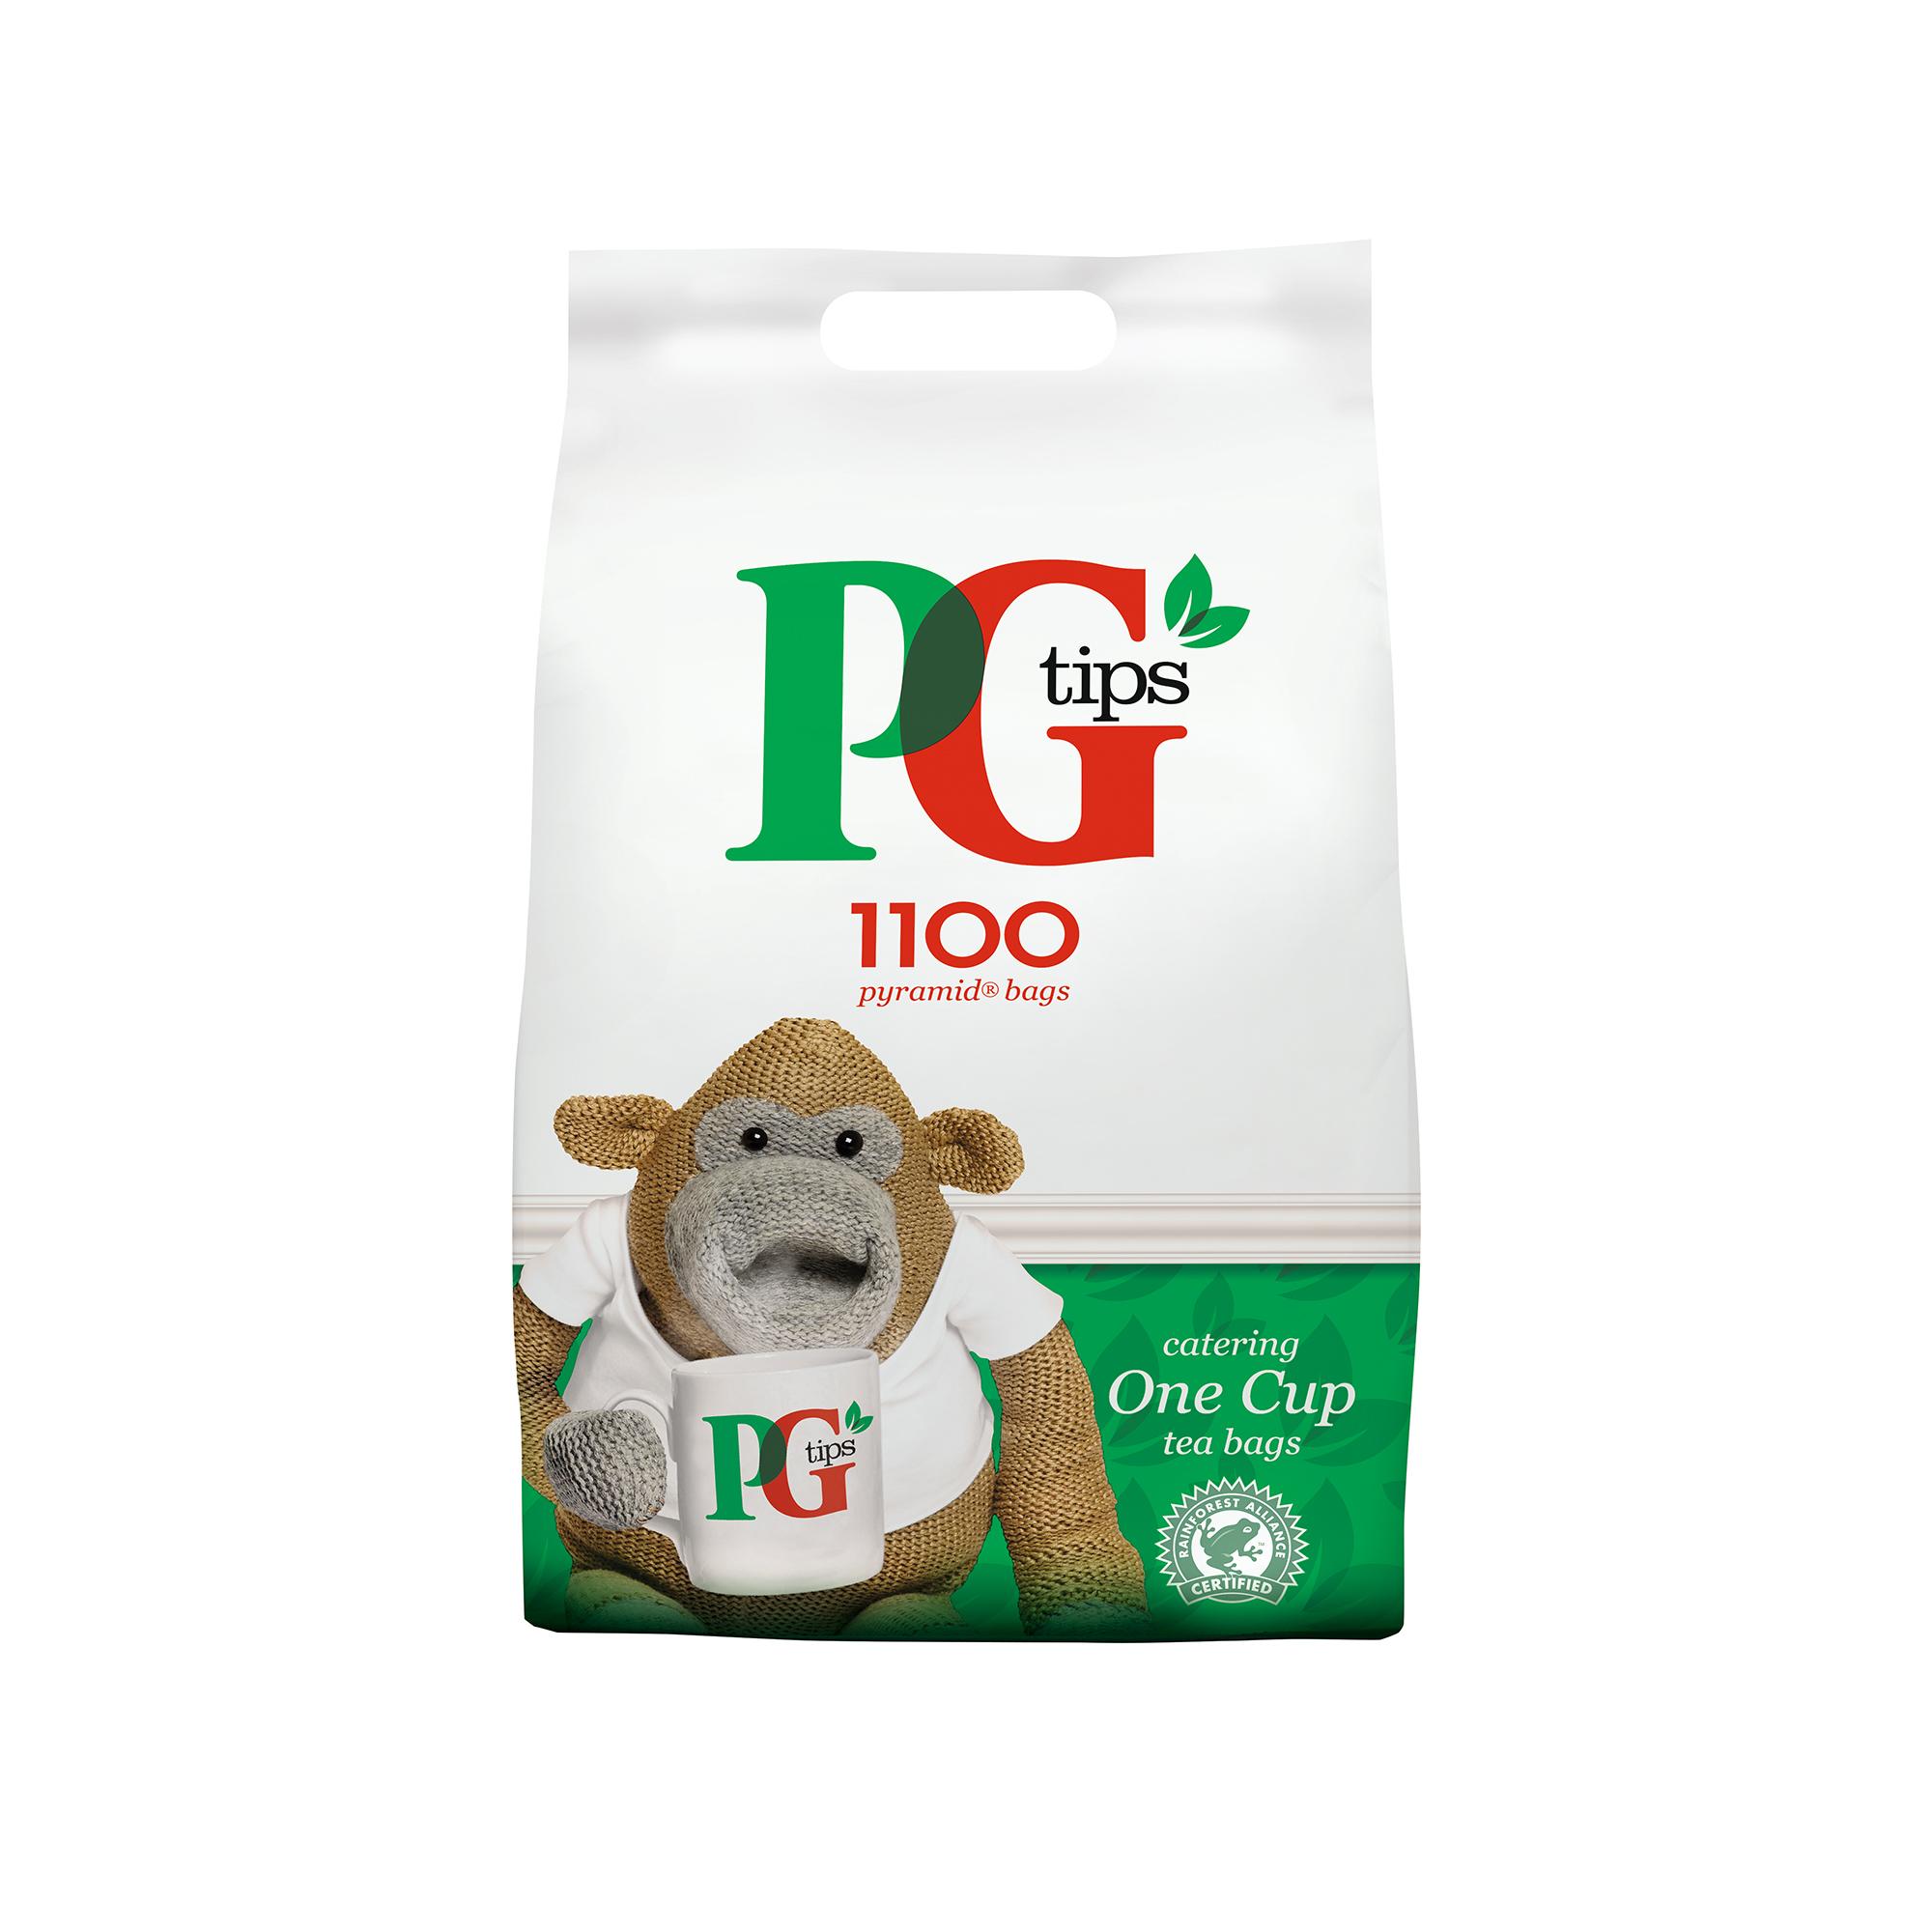 PG Tips Tea Pyramid 1 Cup Ref 67395661 Pack 1100 Buy 2 get Free 2kg Granulated Sugar Apr-Dec 19